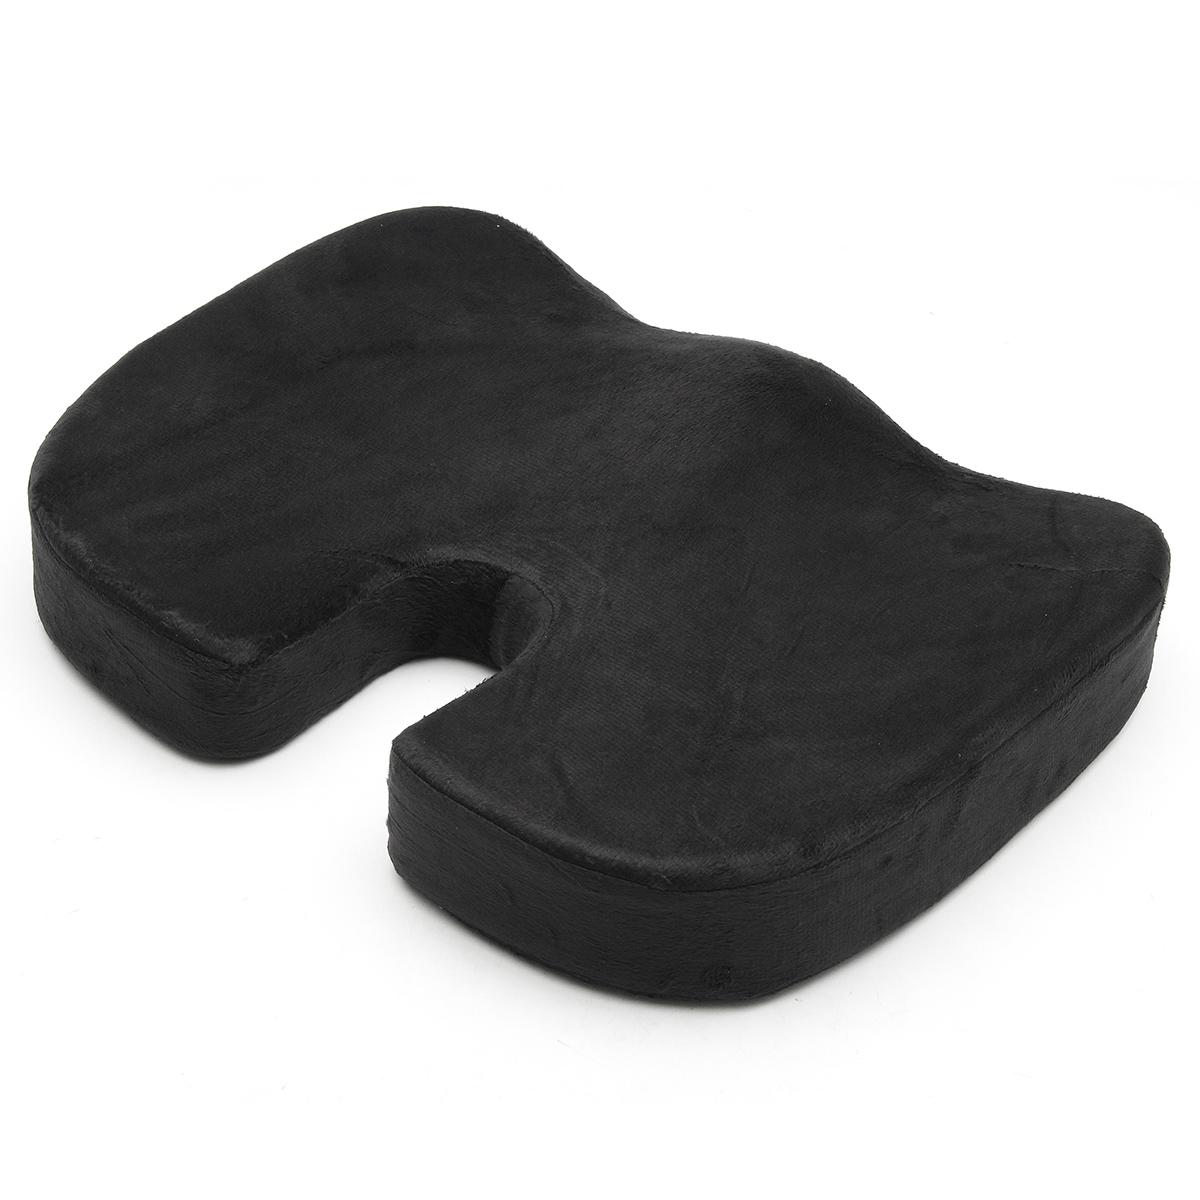 Office Chair Seat Cushion Car Seat Pillow Tailbone Memory Foam Soft Support